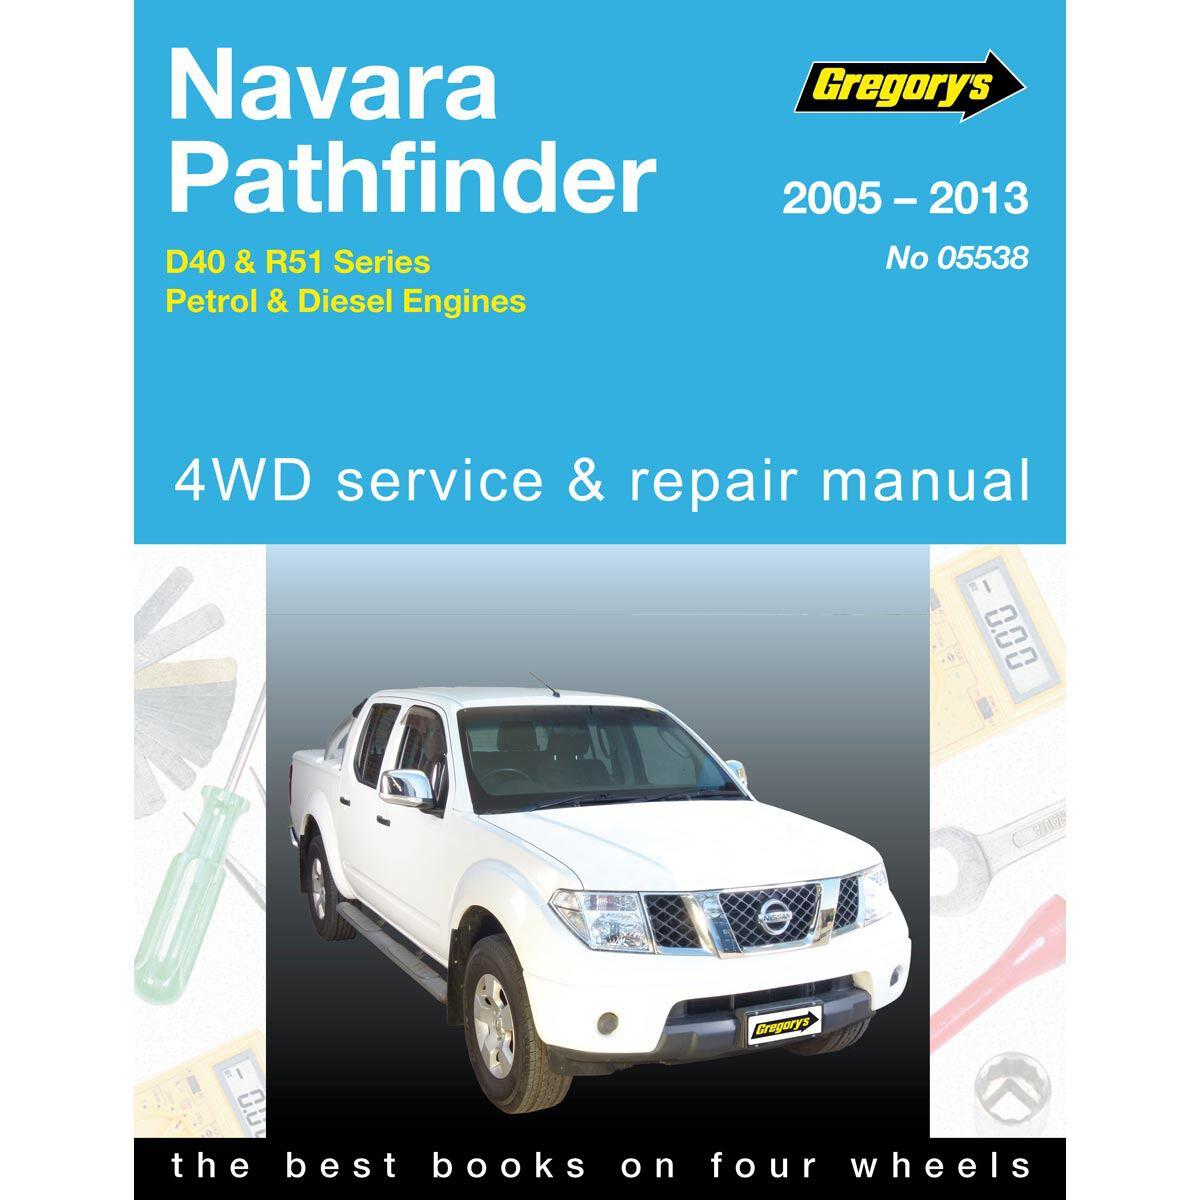 car manual for navara pathfinder d40 538 supercheap auto rh supercheapauto com au nissan navara d40 repair manual pdf nissan navara d40 owners manual free